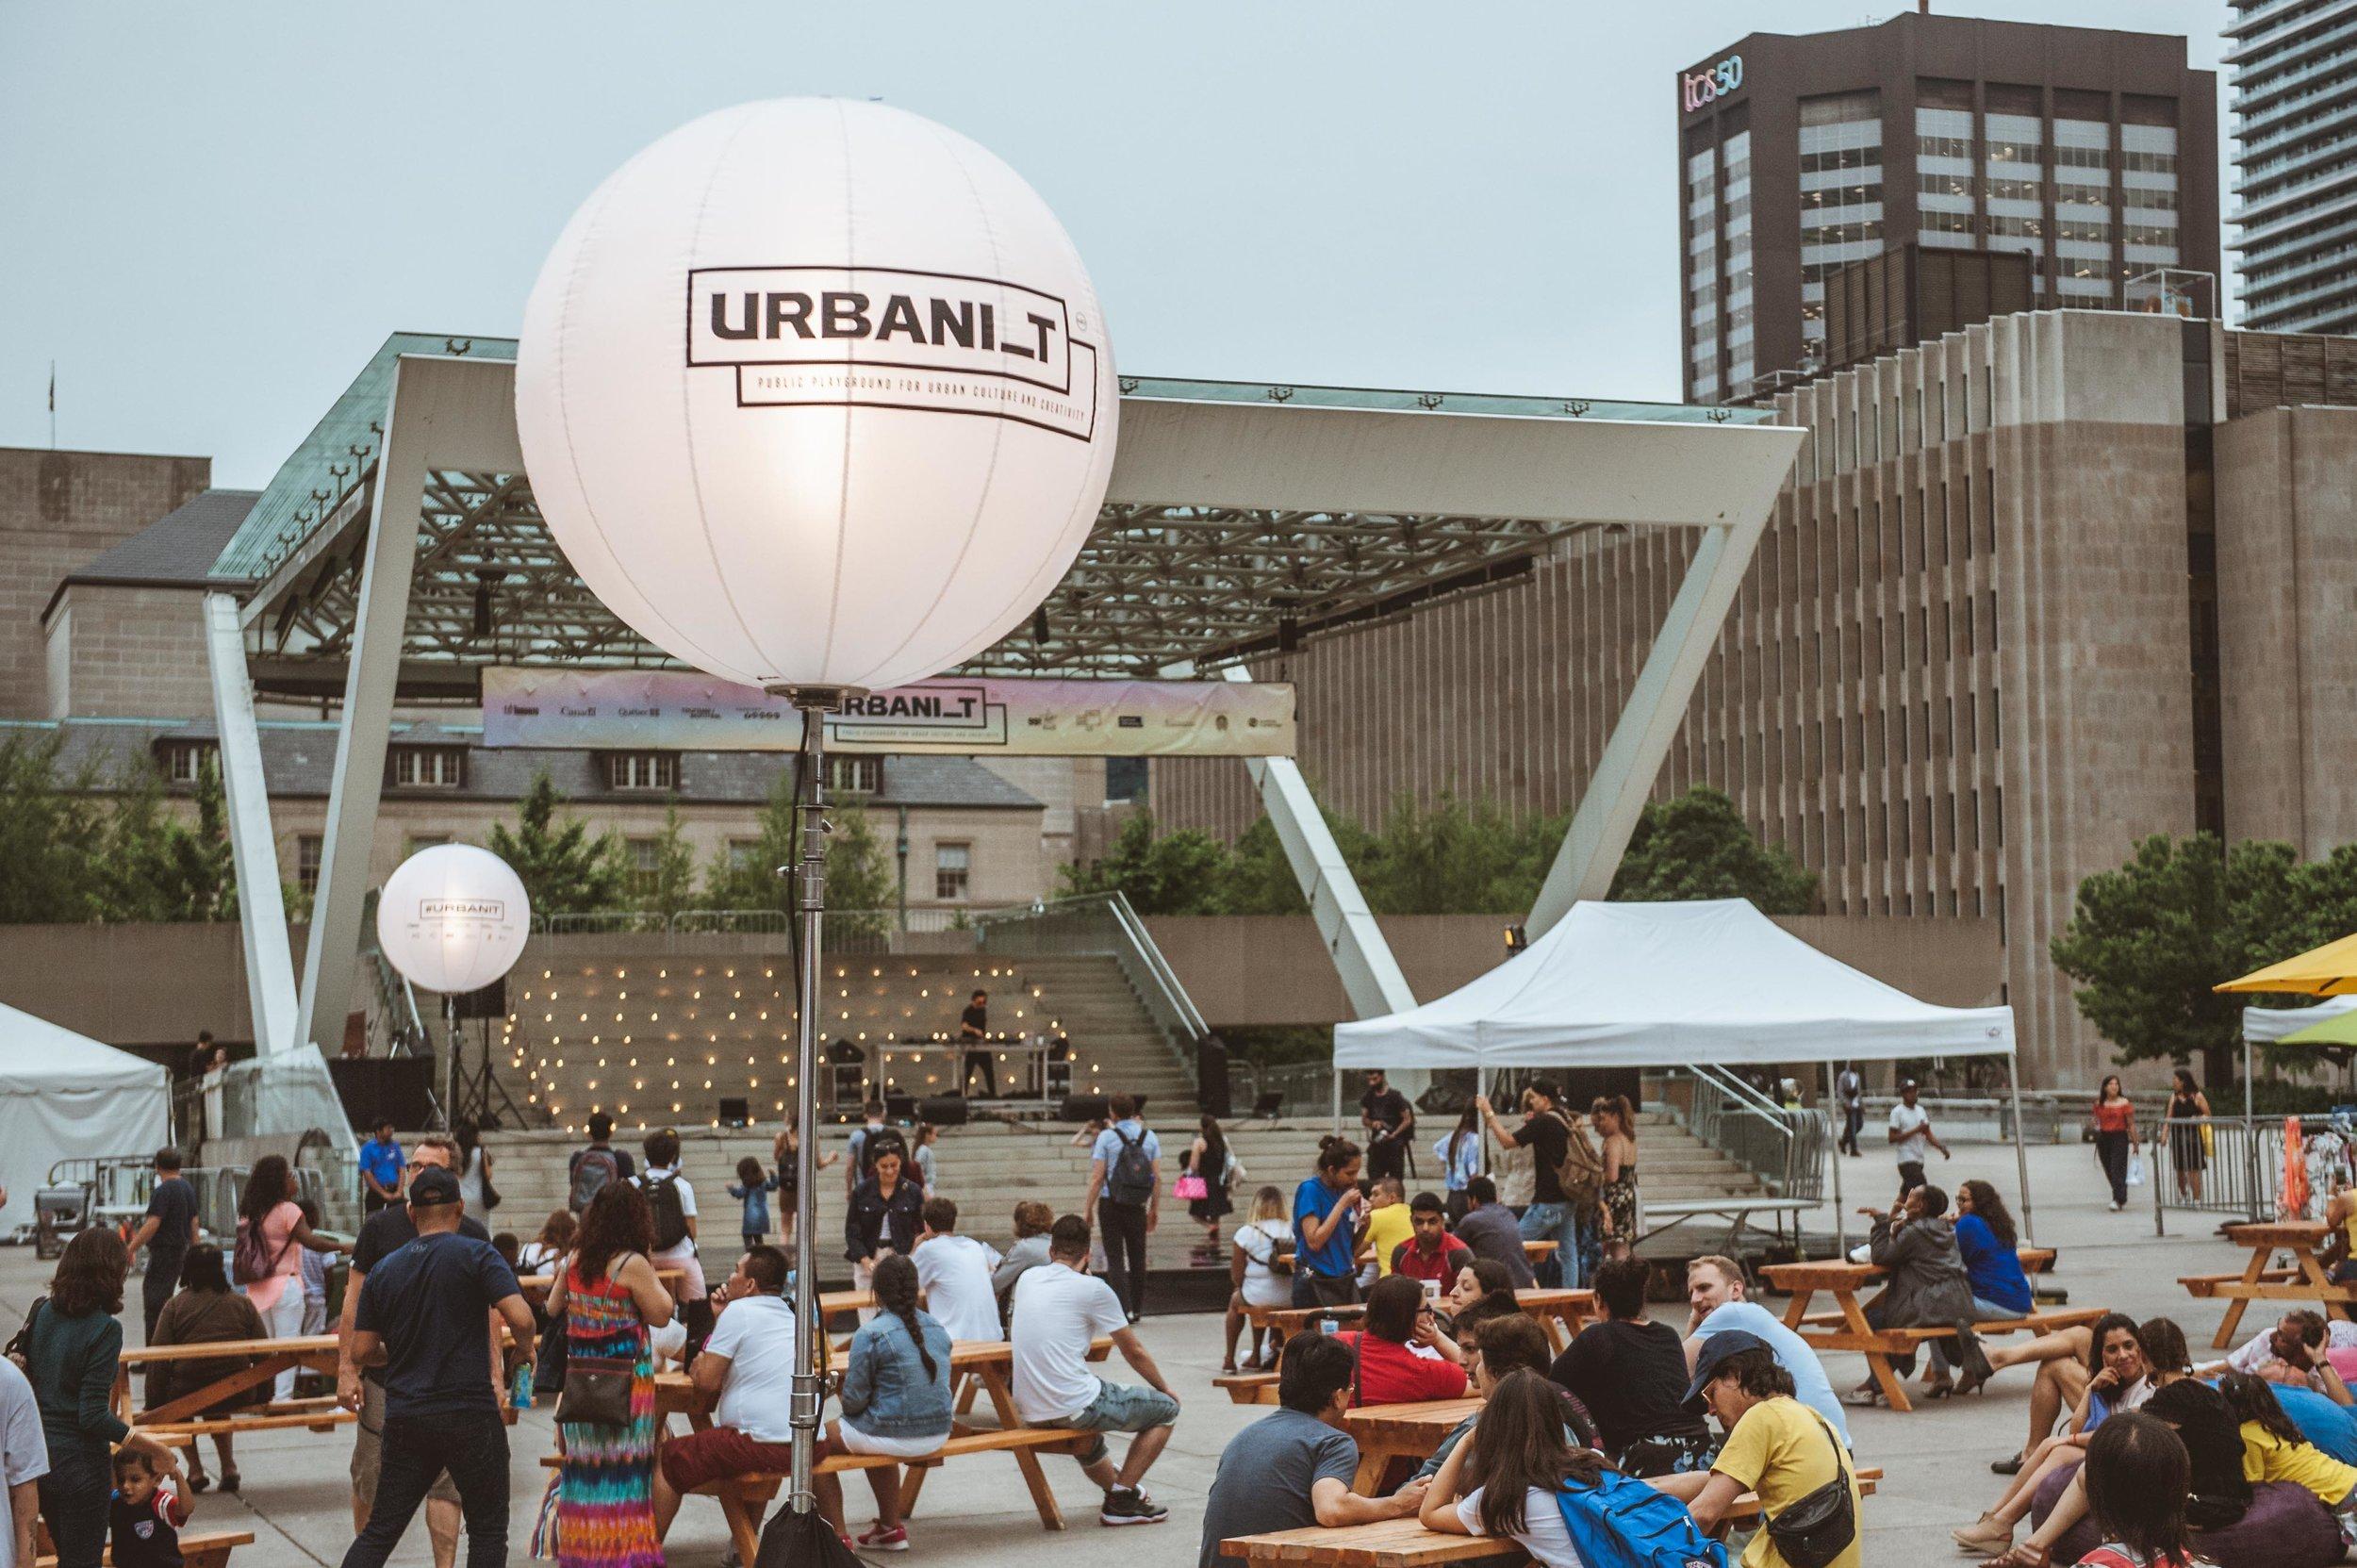 urbani-t-day2-chelsea-58.jpg